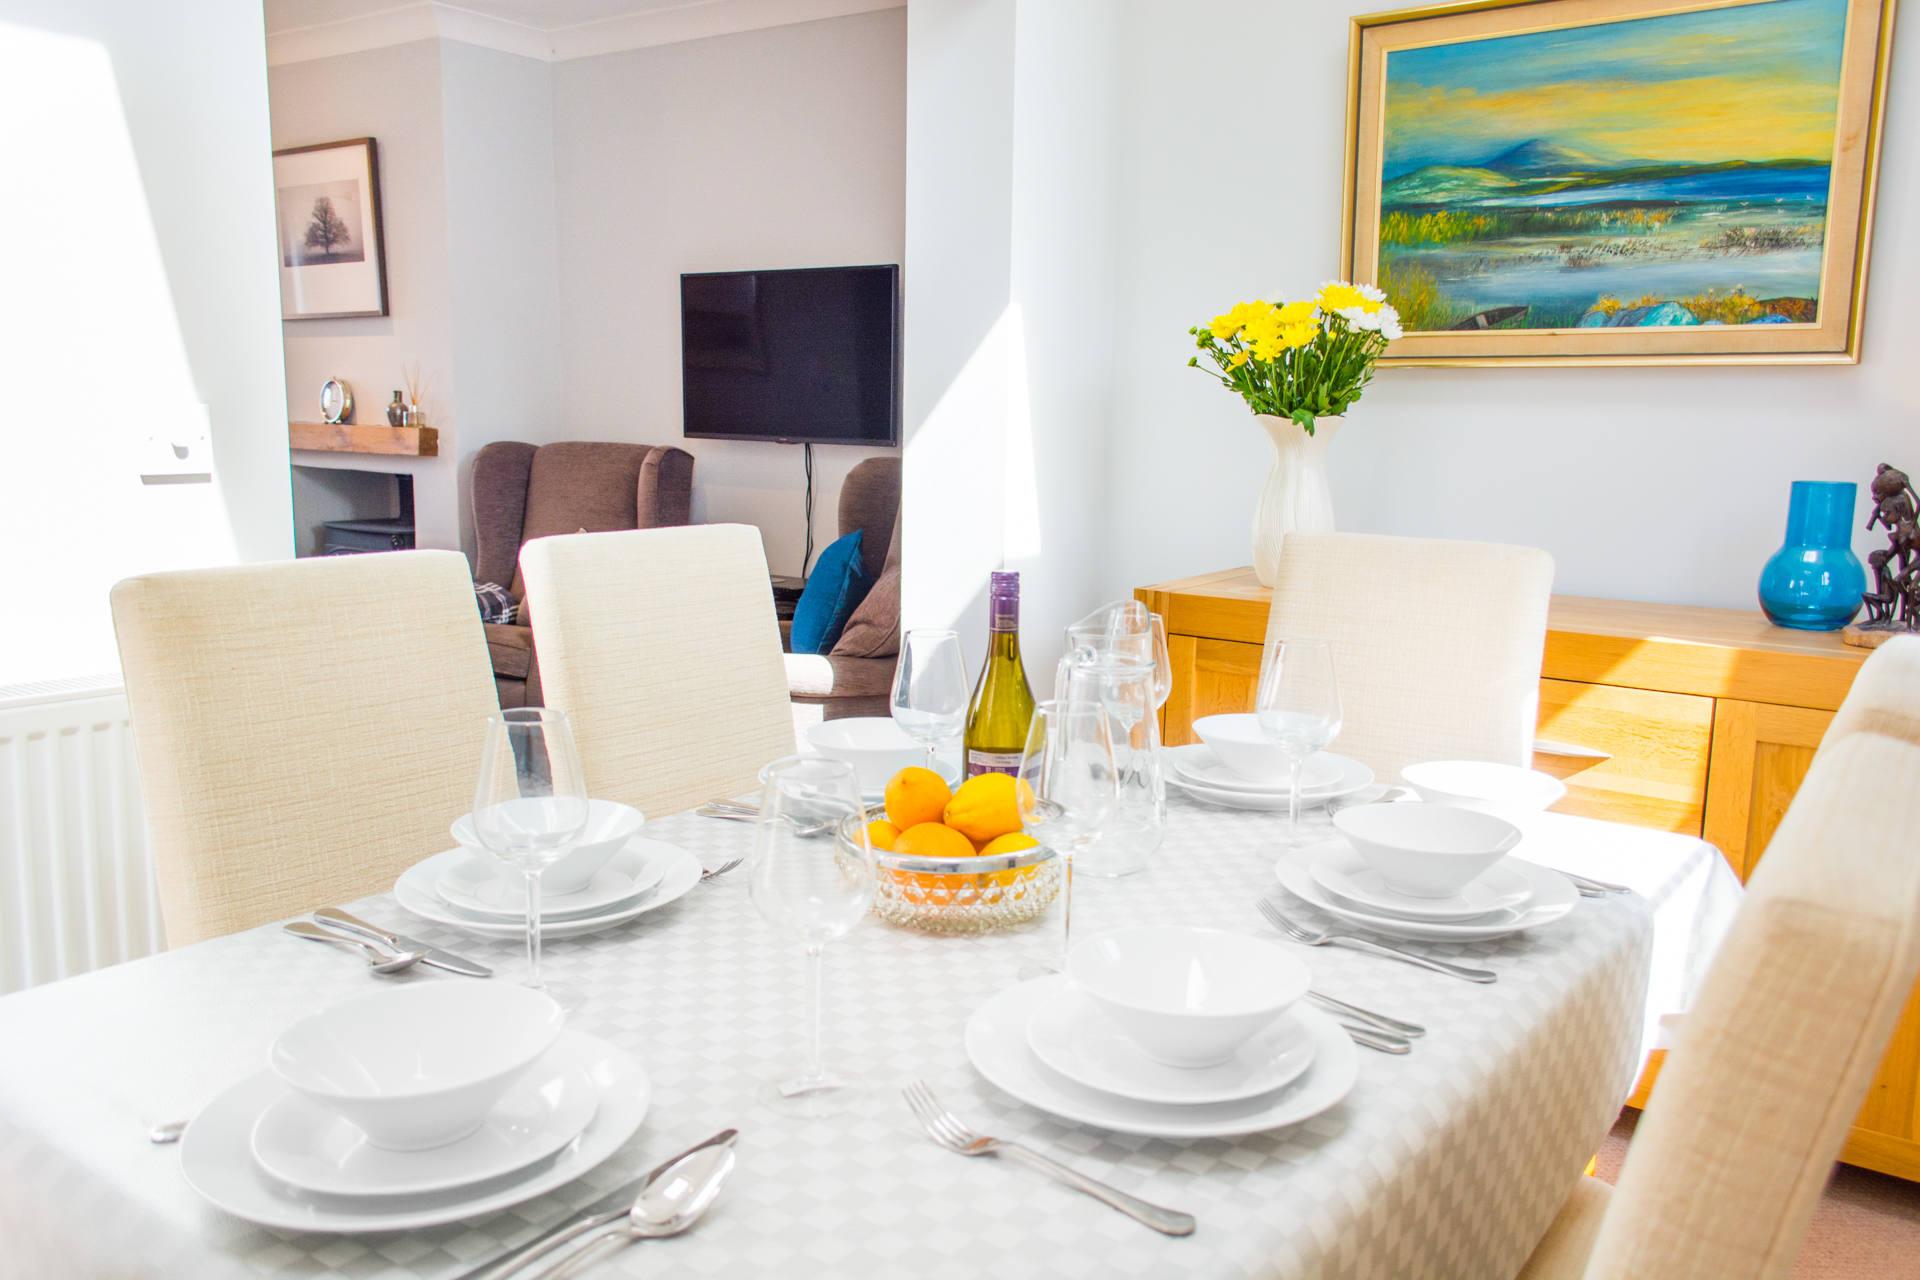 Close up photo of dining set and crockery.